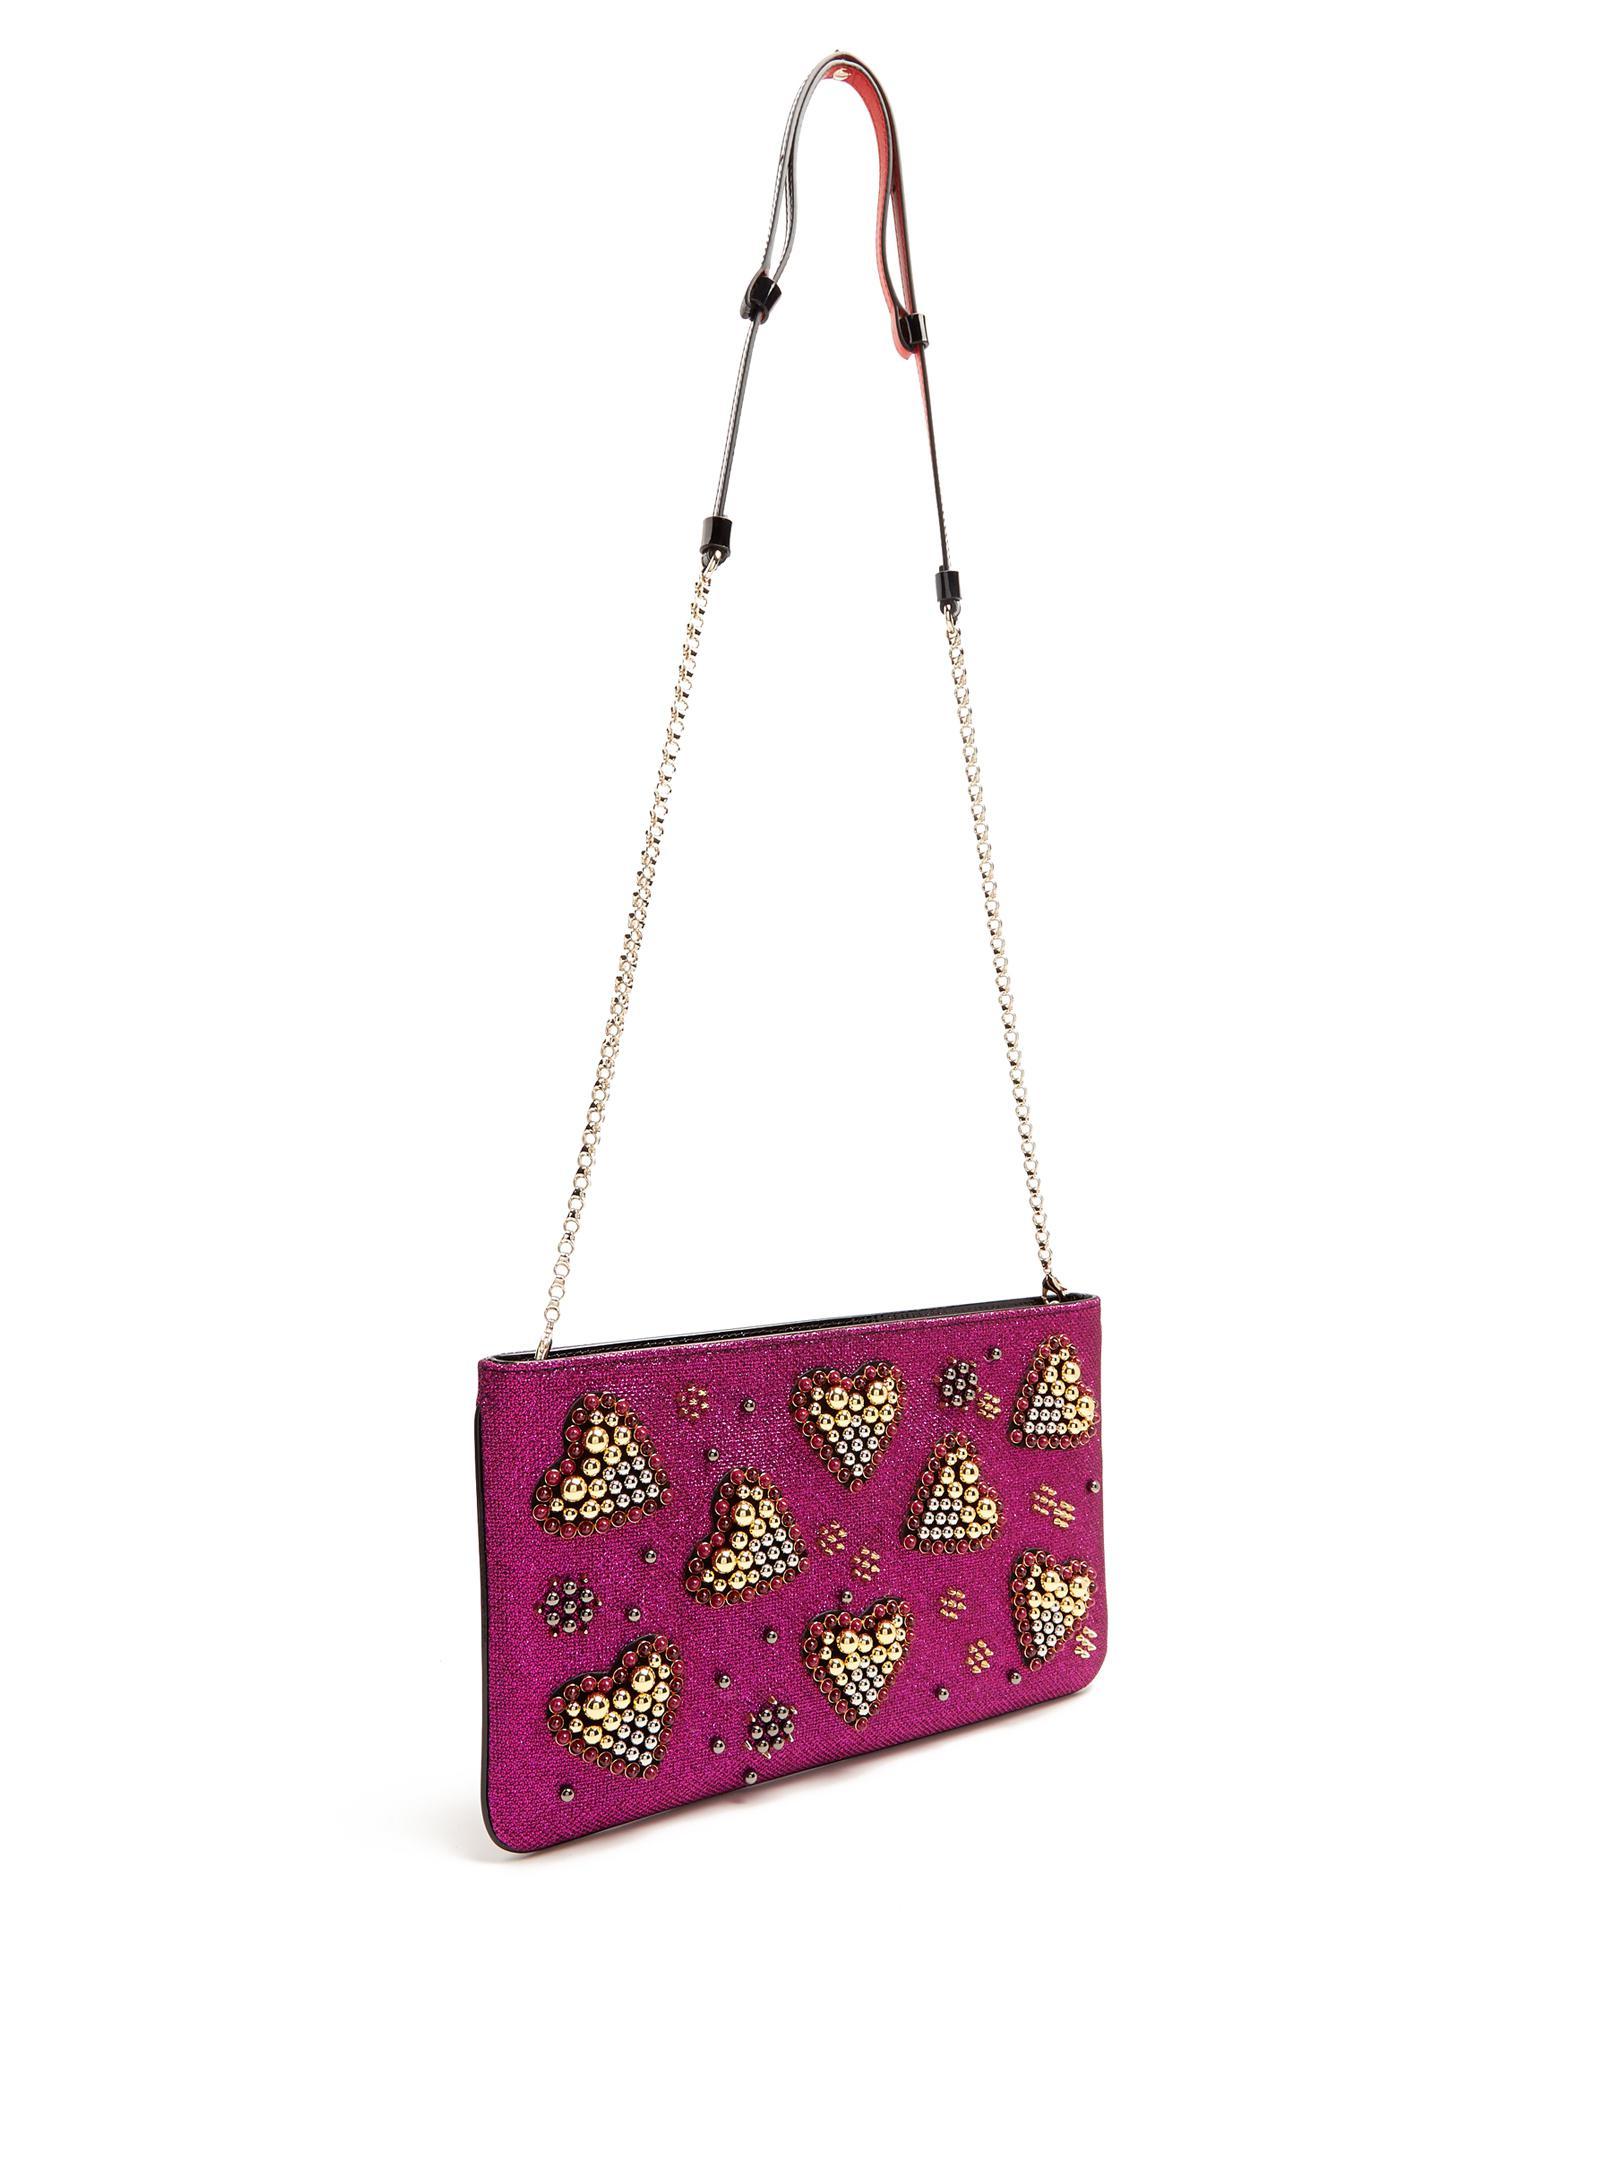 0b0f02857eb Lyst - Christian Louboutin Loubiposh Spike-embellished Glitter Pouch